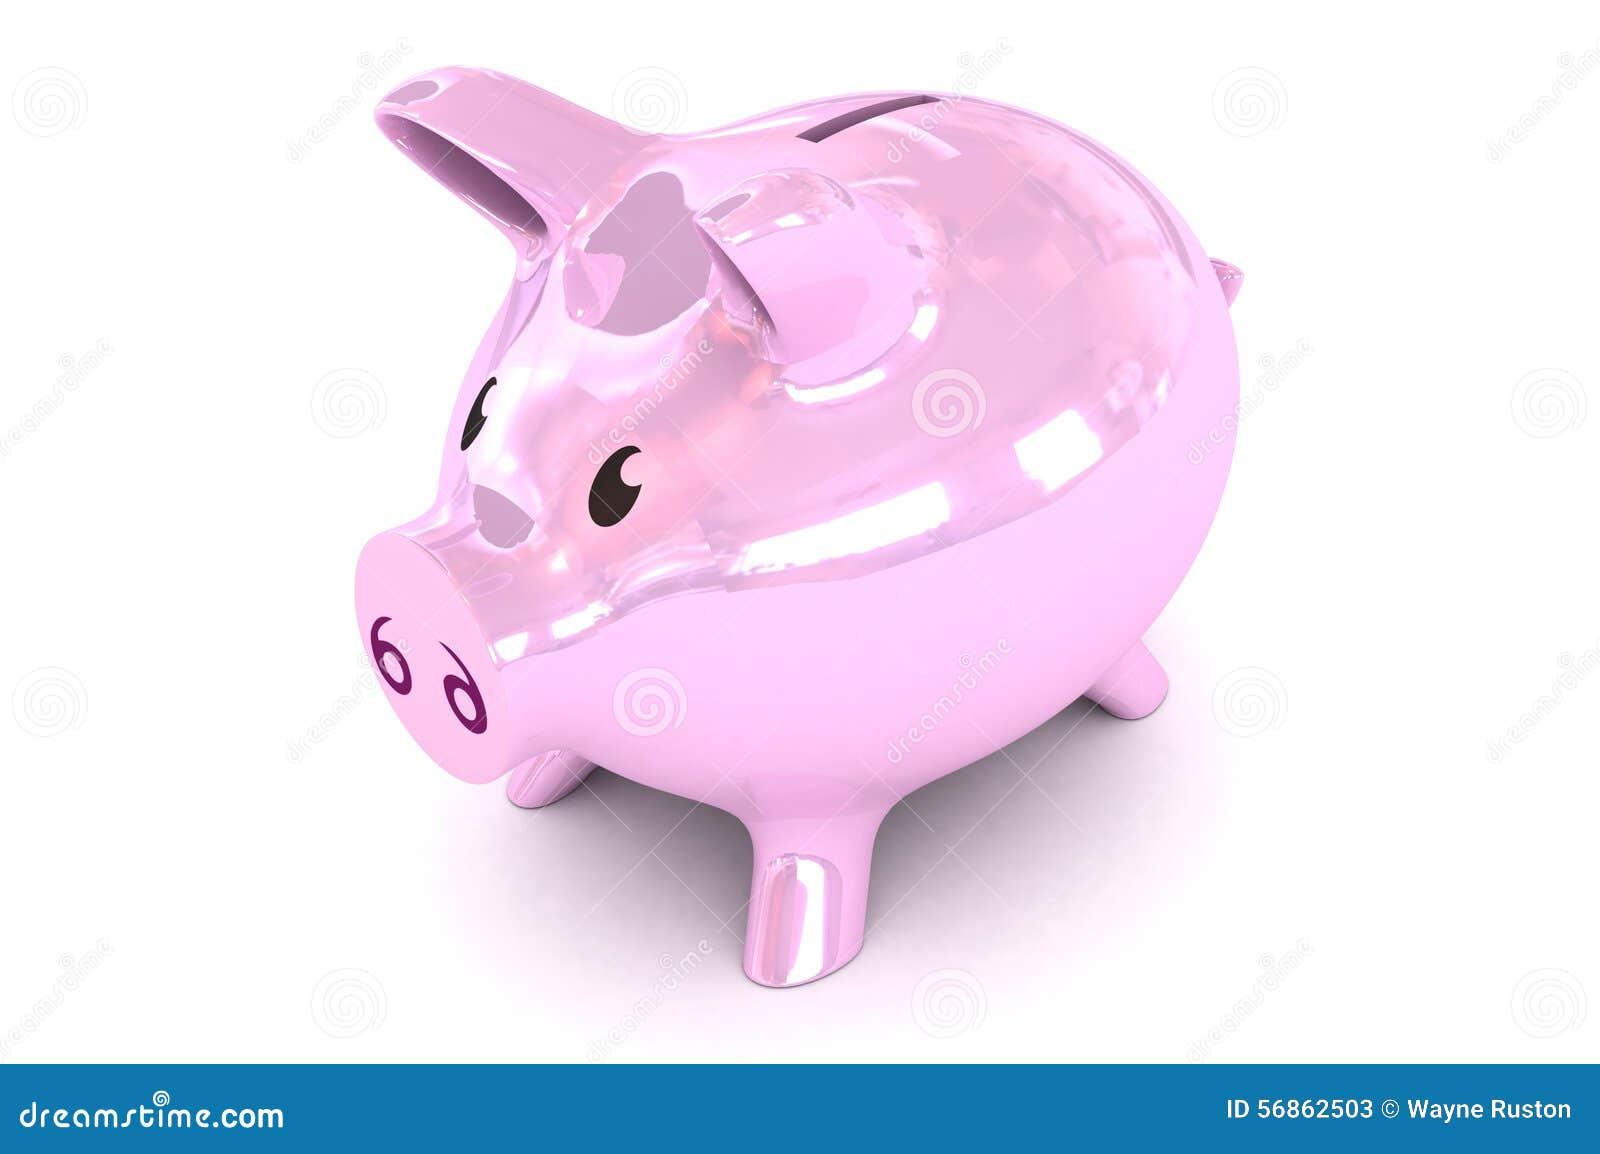 Piggybank illustration